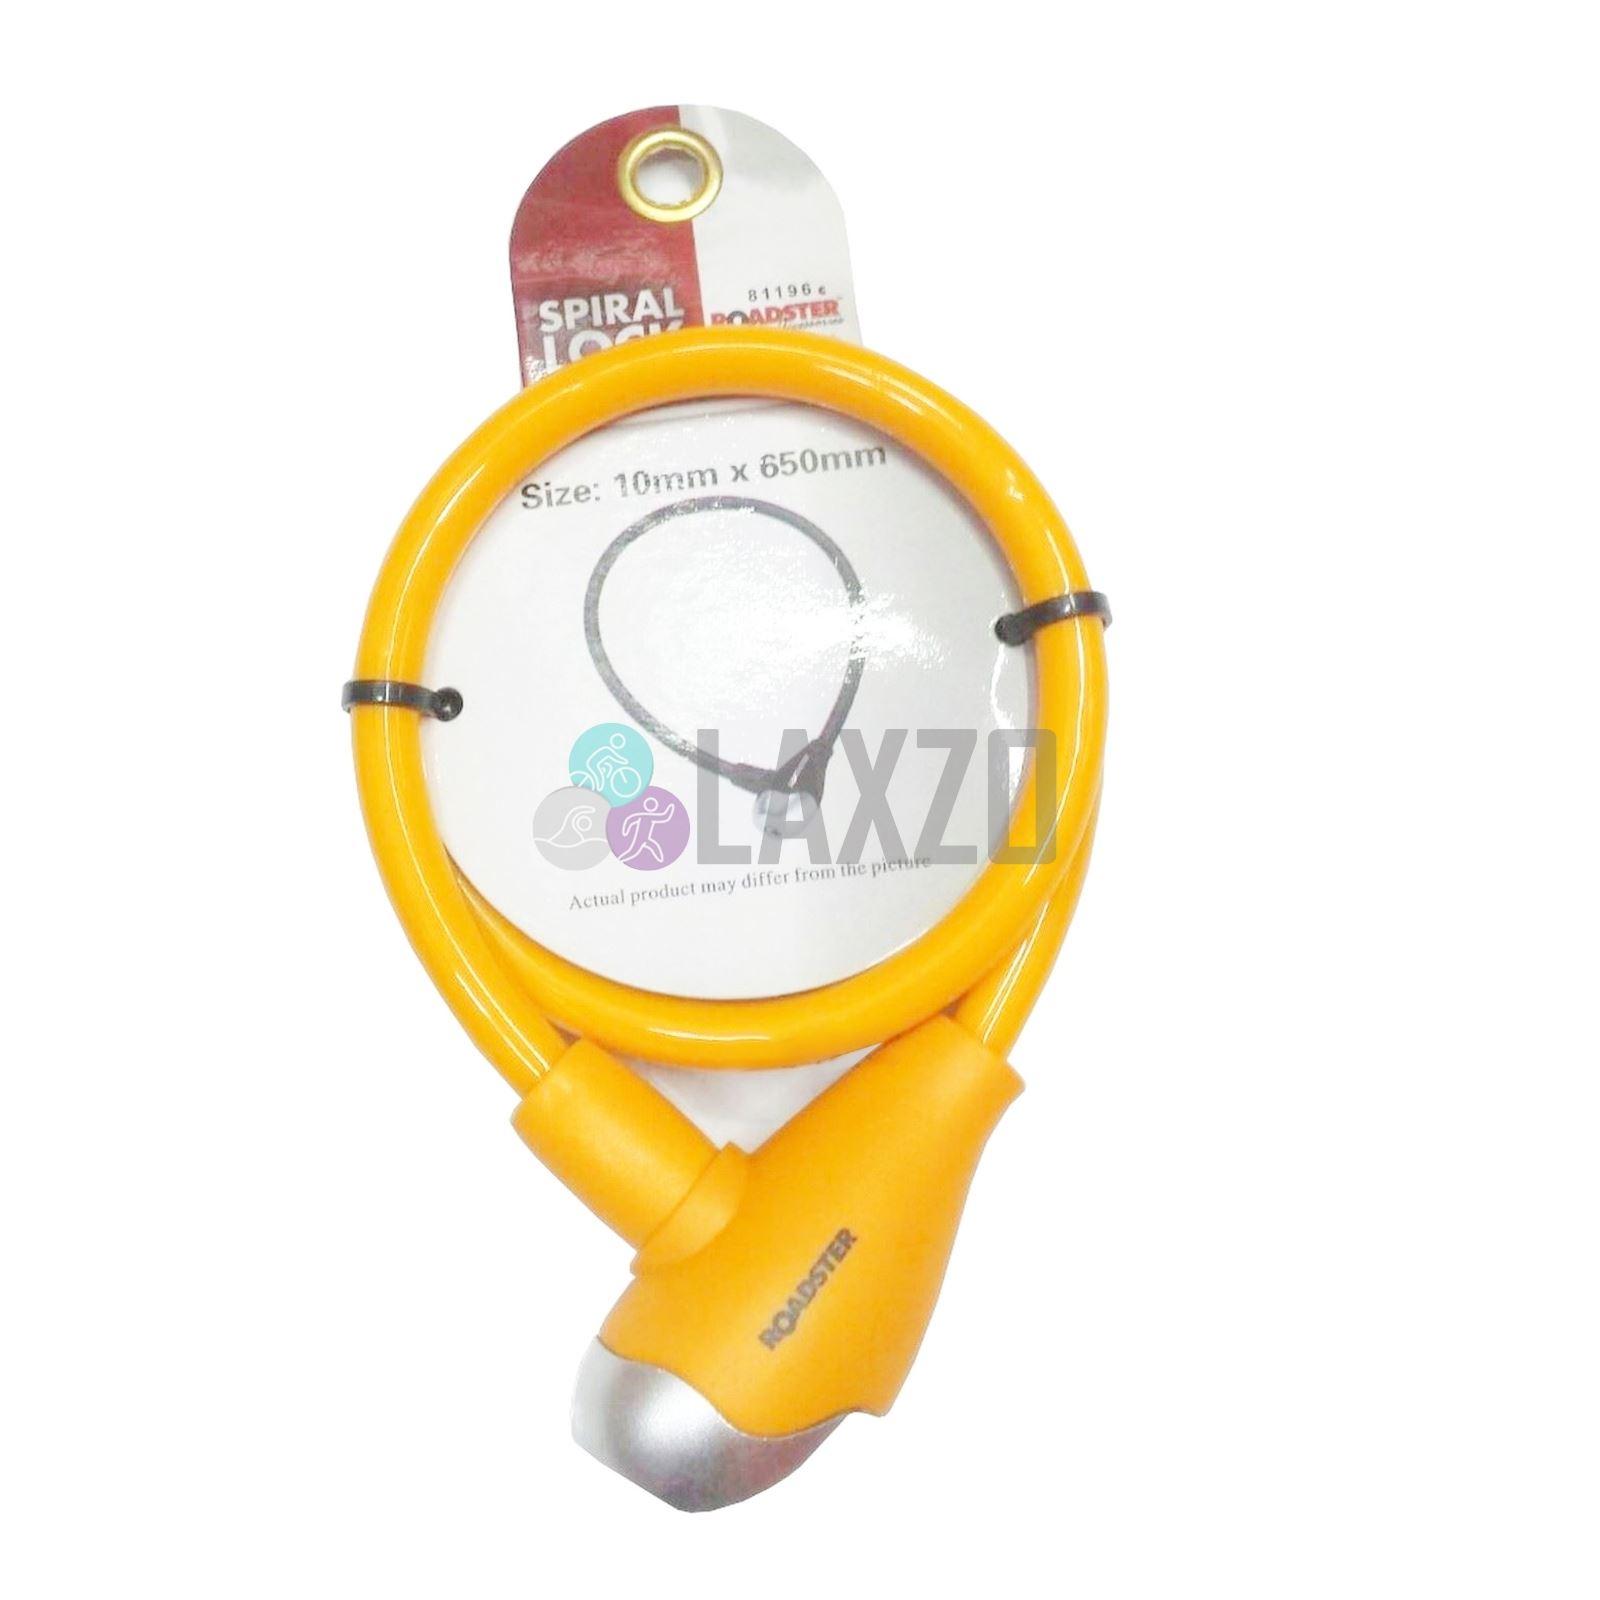 Bike Spiral 2 Key Lock Bike Steel Cable Chain Keylock 7mm x 650mm Bicycle